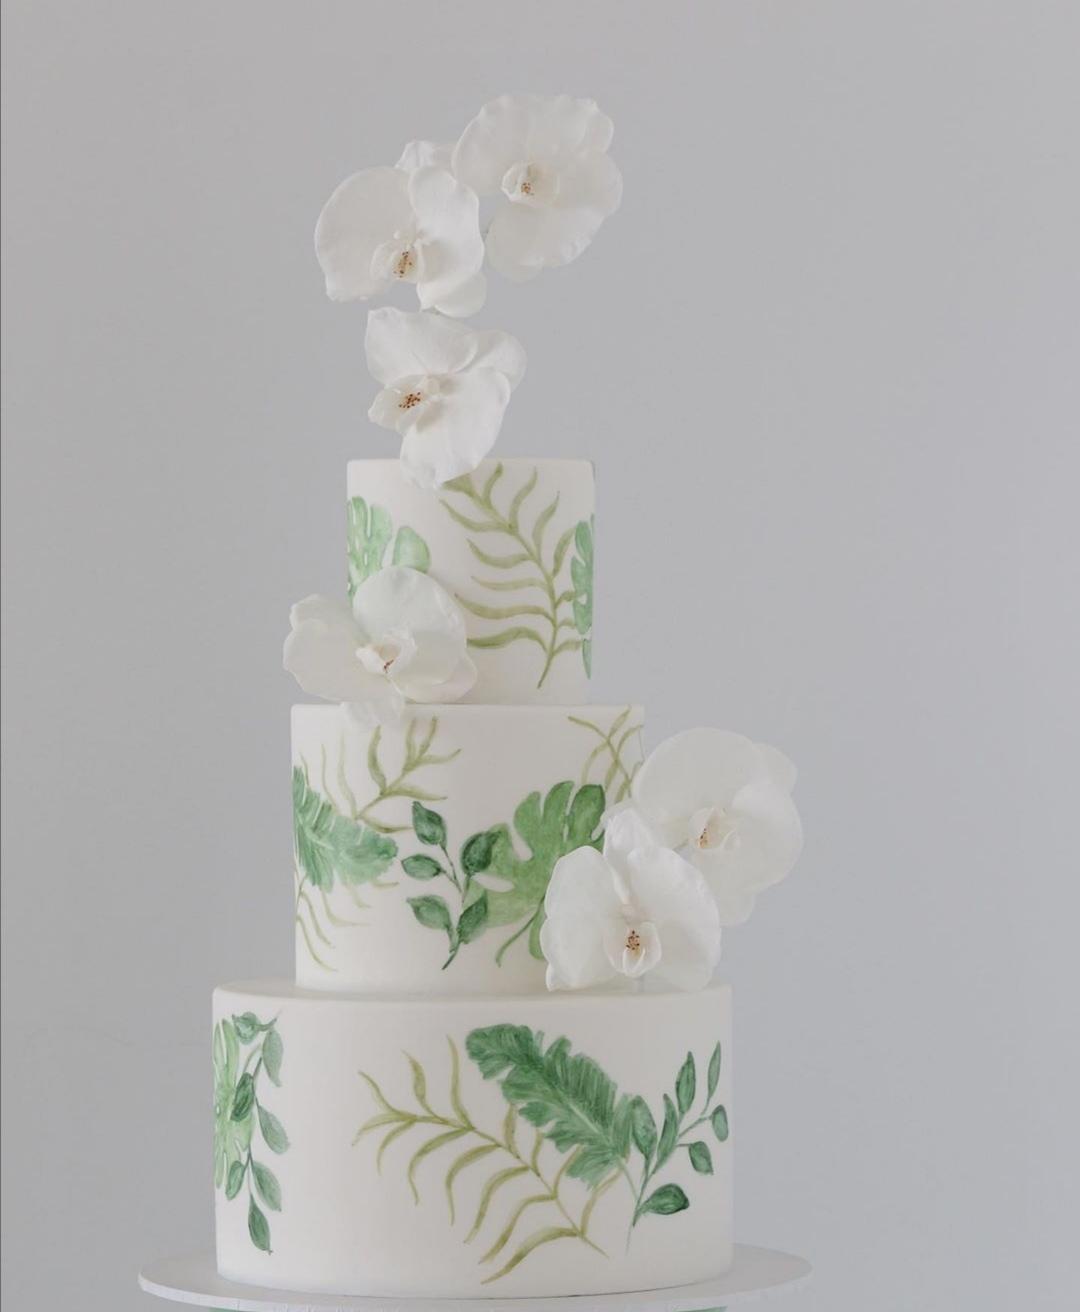 Green painted wedding cake